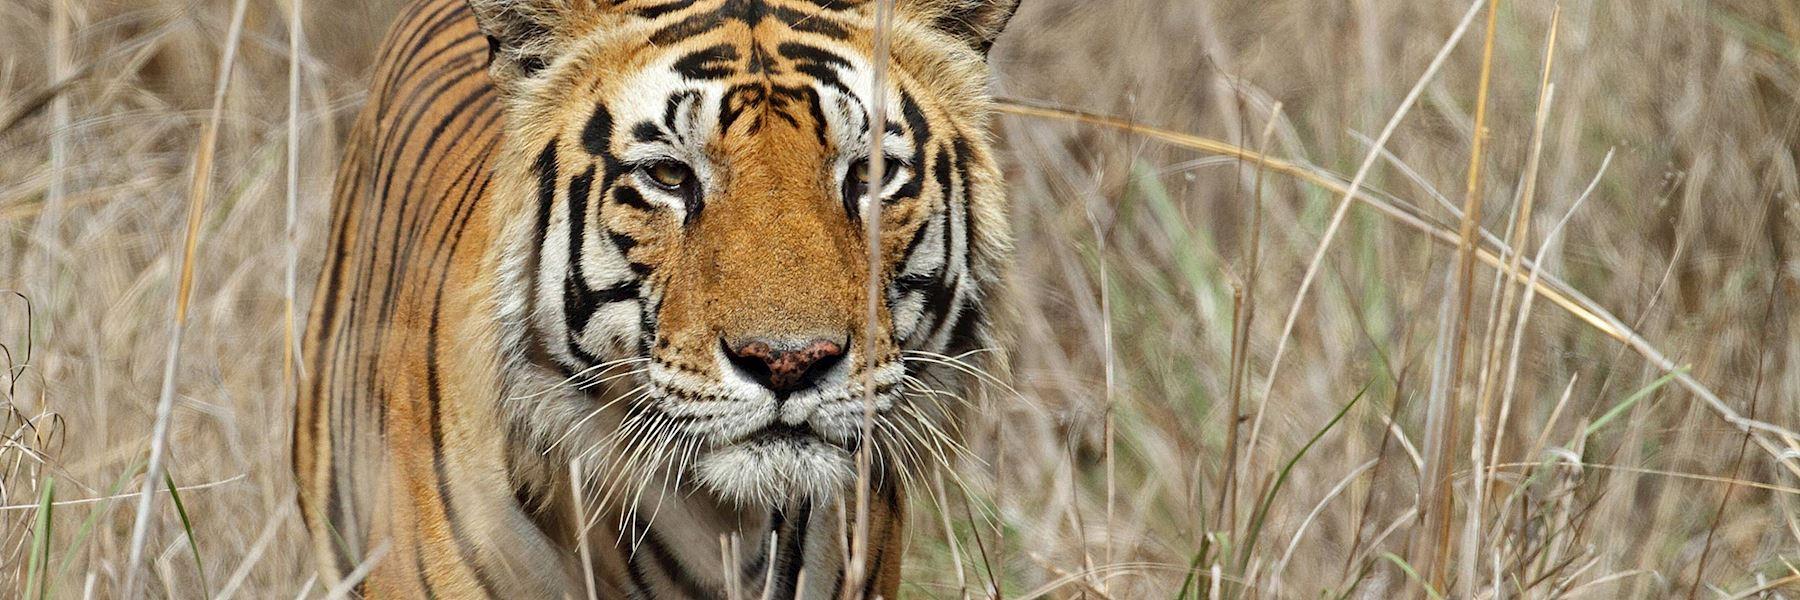 Visit Kanha National Park, India